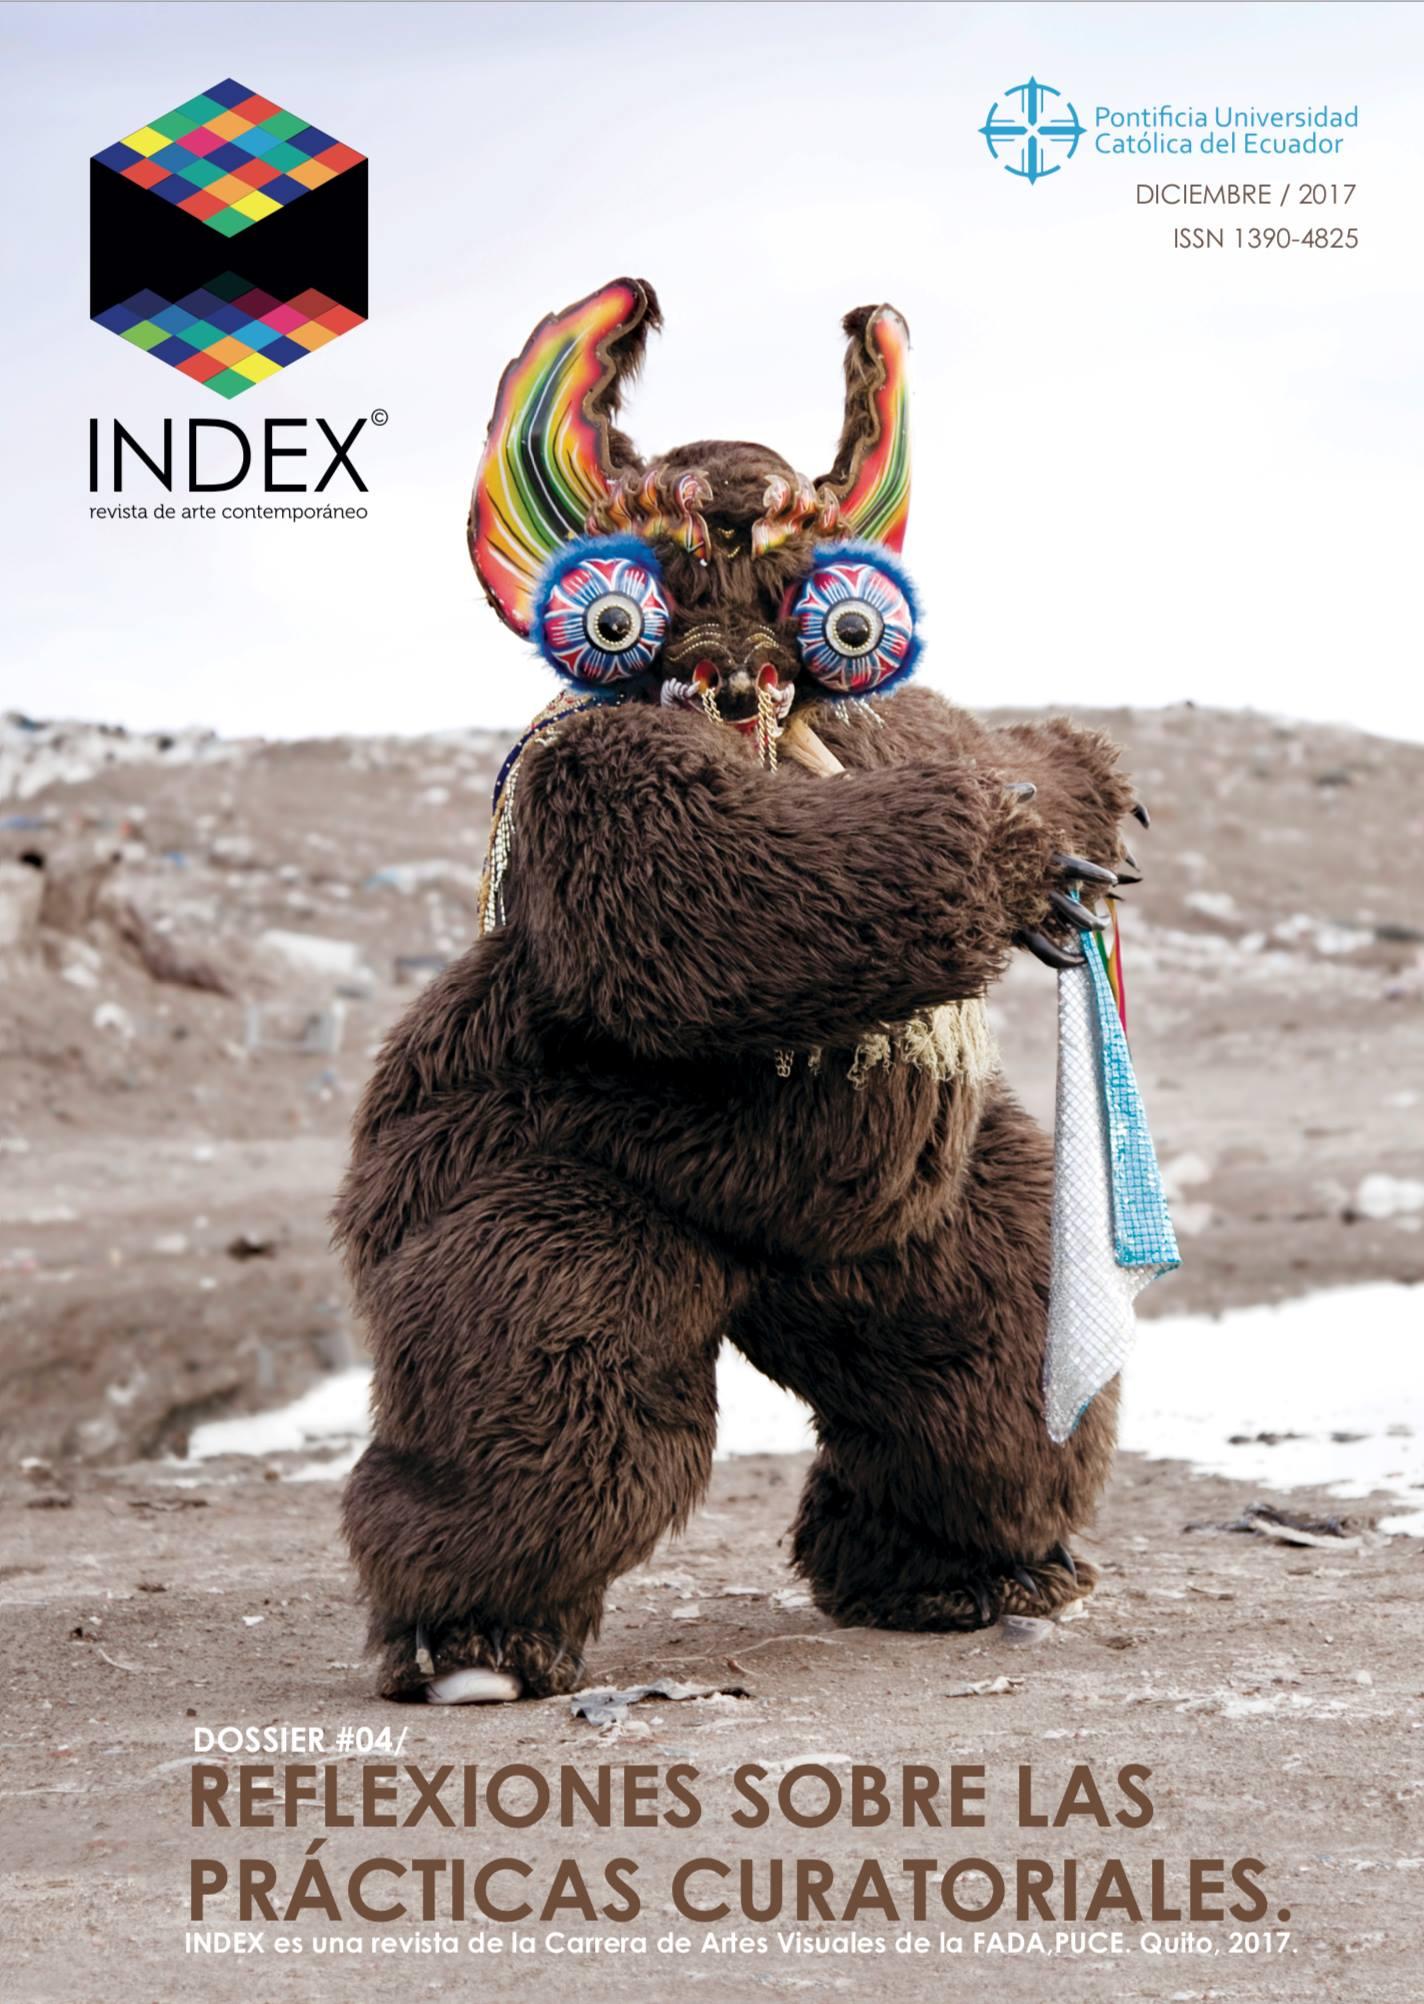 Portada Index diciembre 2017. Autor: Demian Schopf